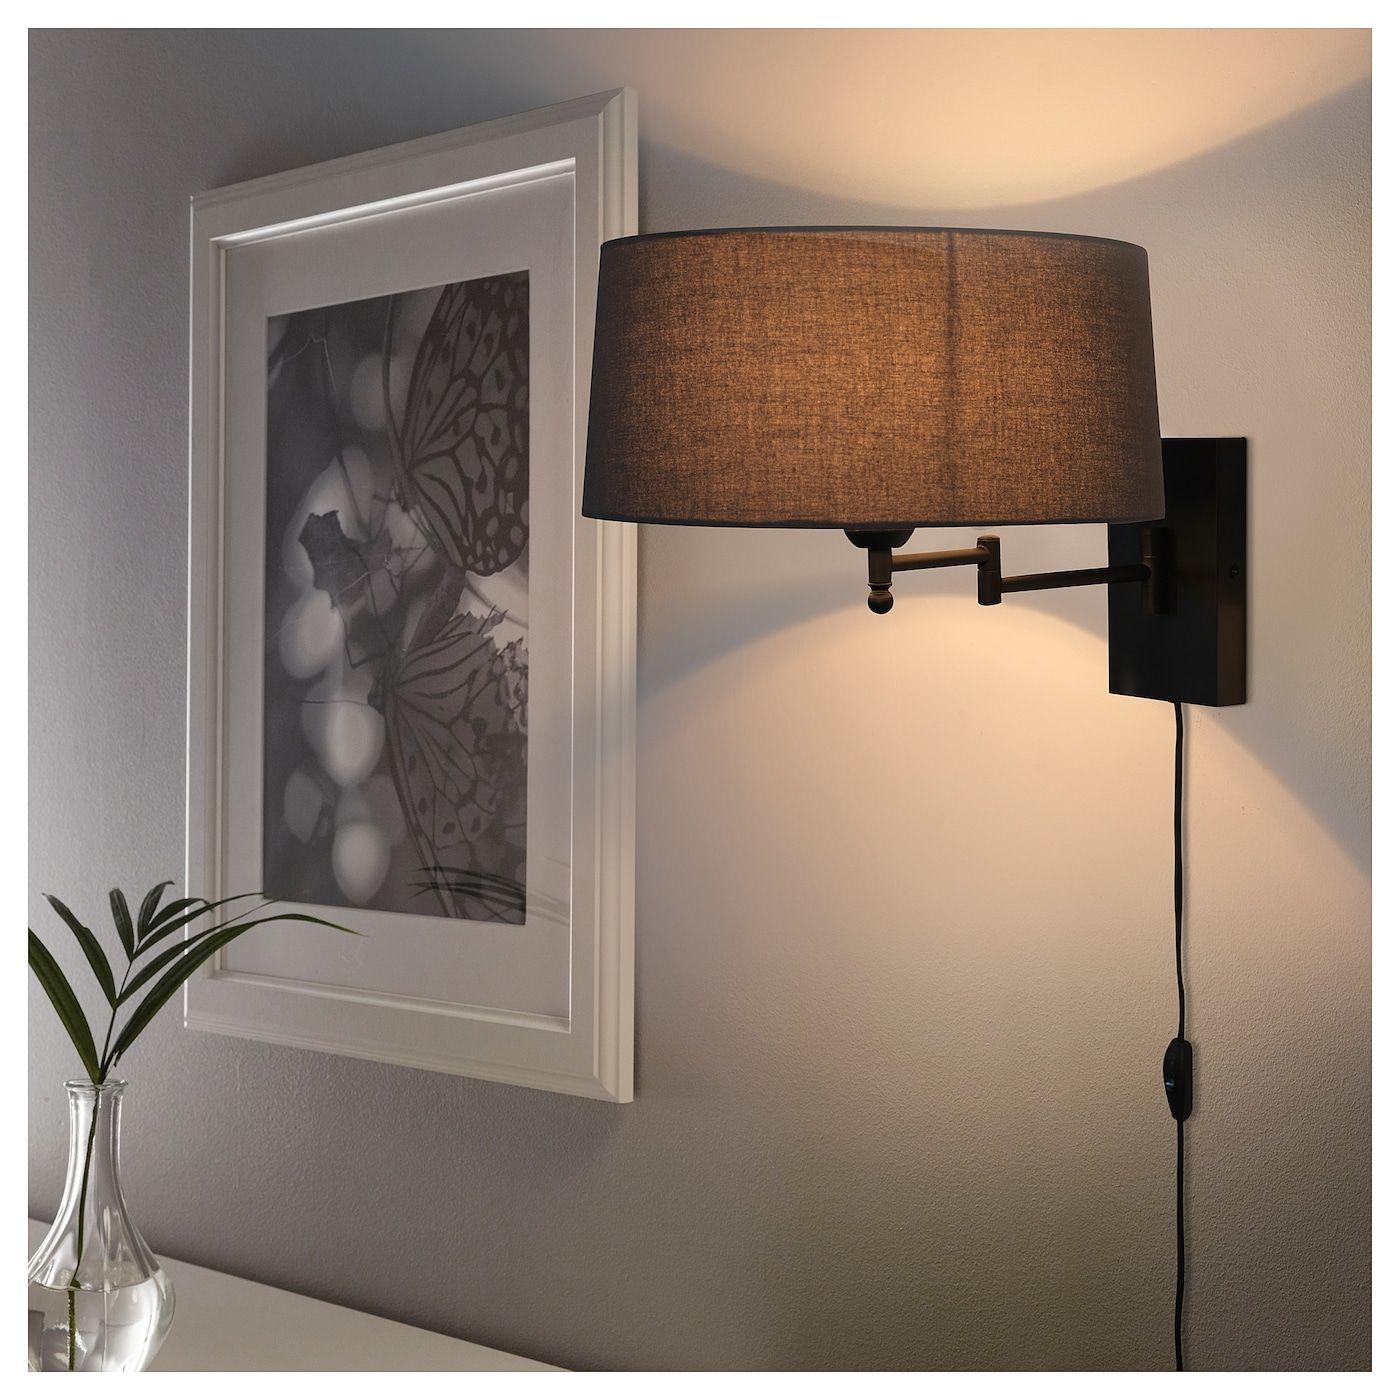 Halkip Wall Lamp With Swing Arm Gray Ikea Wall Lights Bedroom Wall Lamps Bedroom Wall Mounted Lights Bedroom